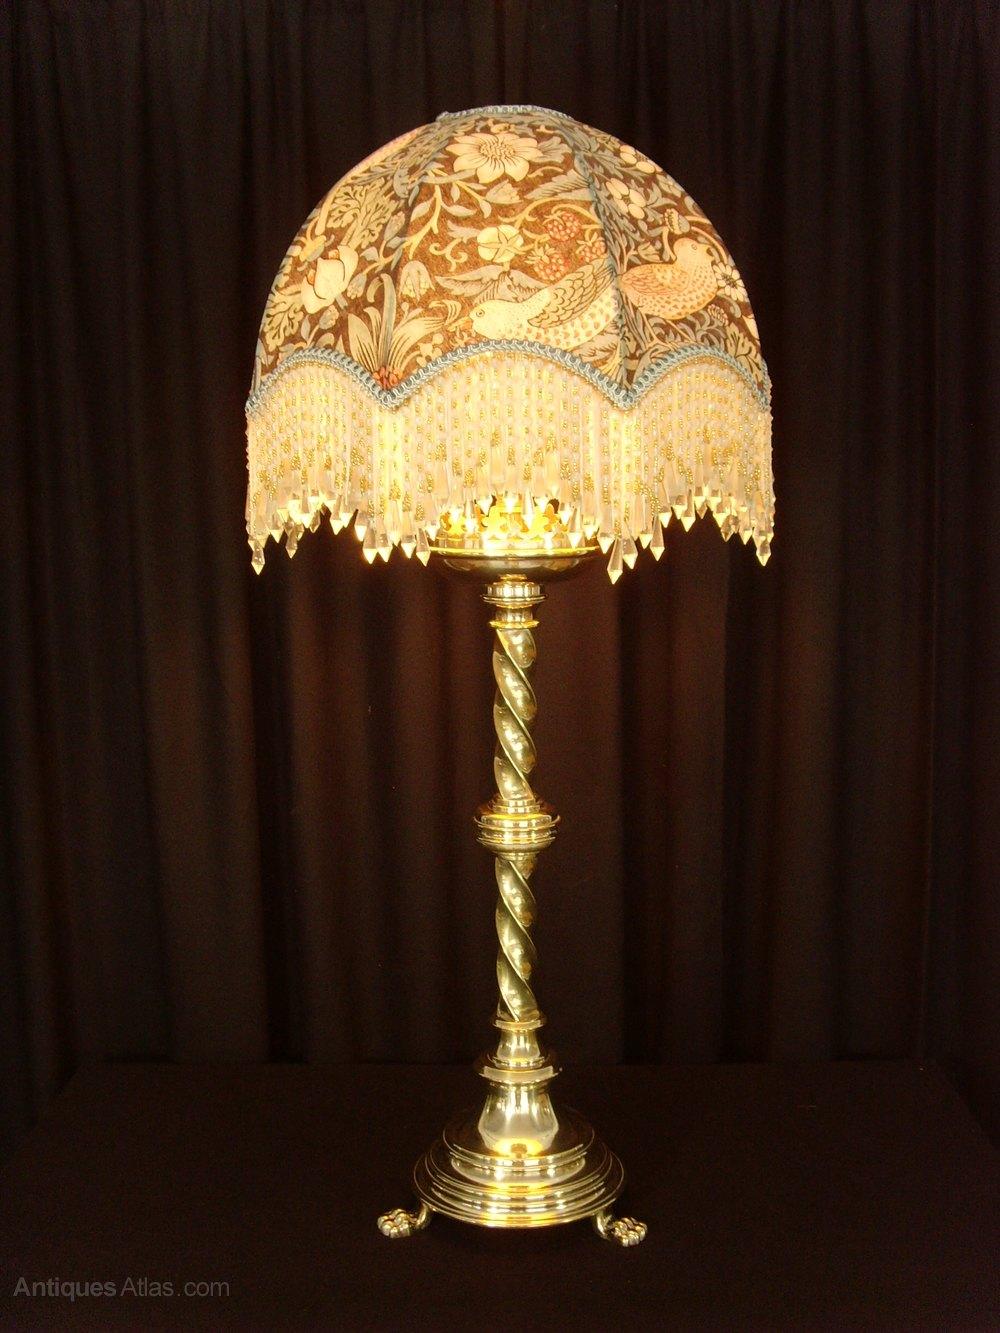 Antiques atlas gothic brass table lamp william morris shade gothic brass table lamp william morris shade antique table lights greentooth Choice Image